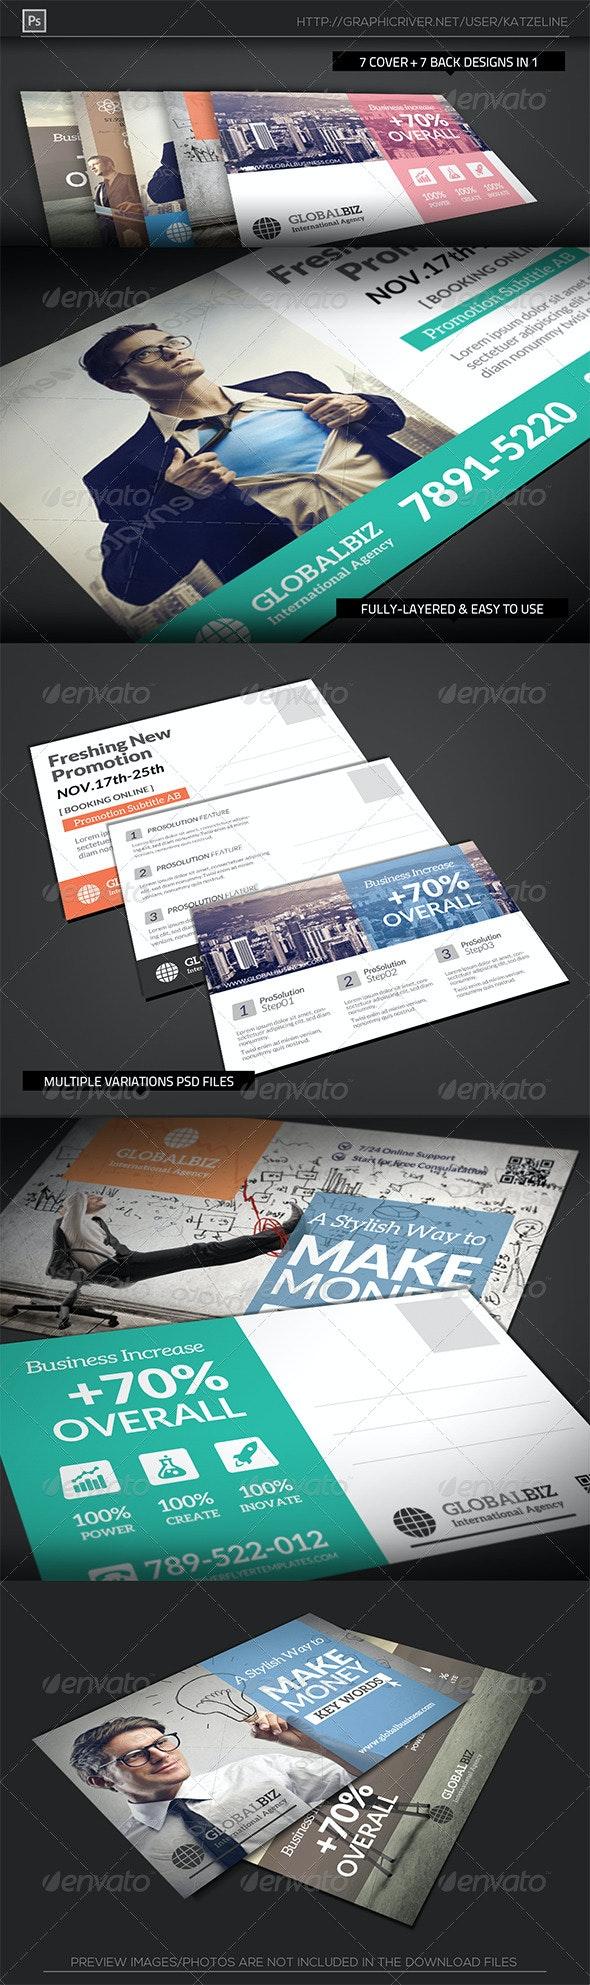 Business Postcard Template - Corporate Flyers